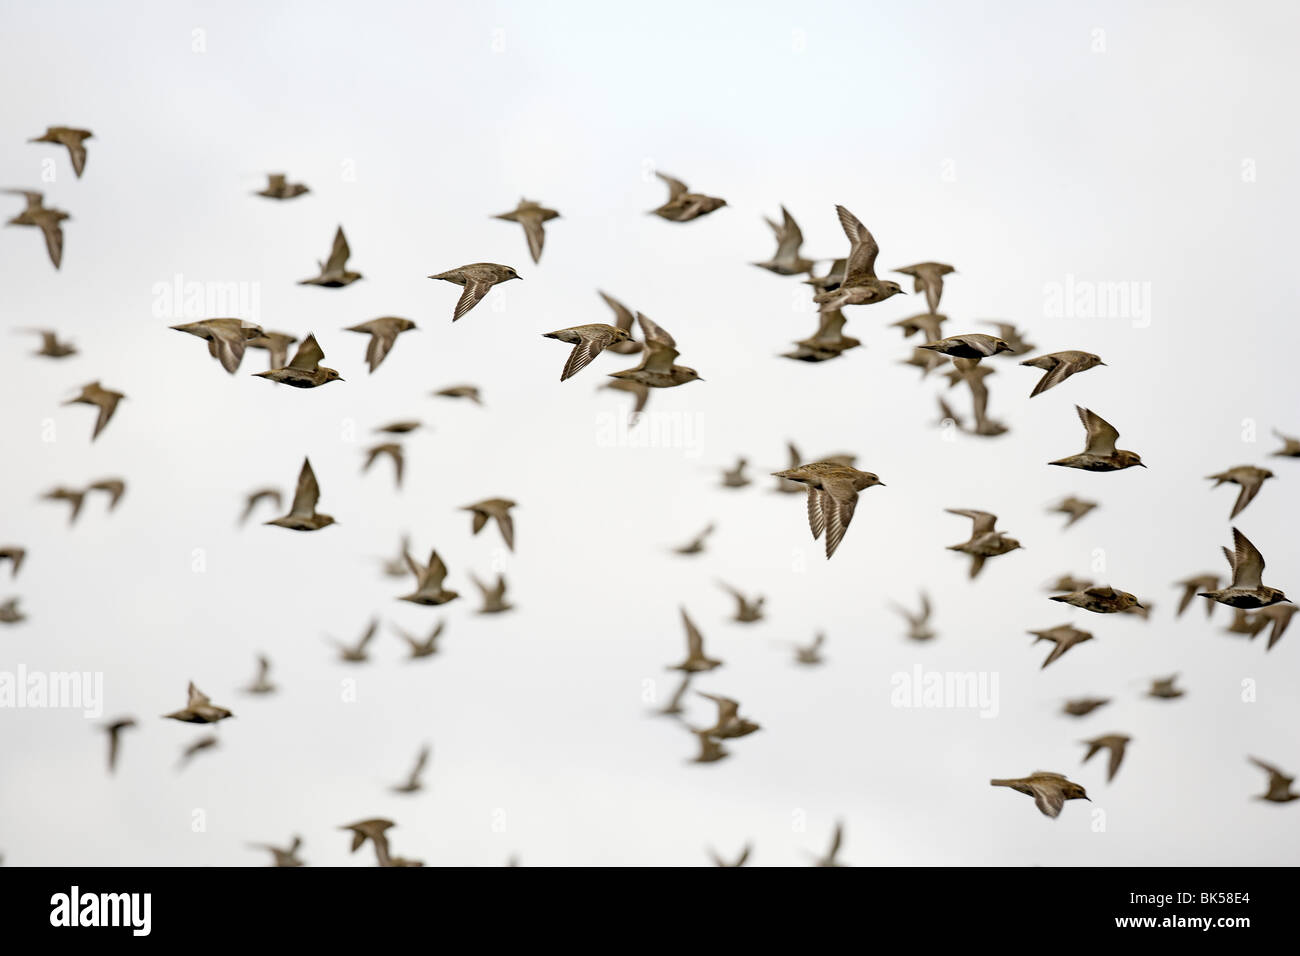 flock-of-golden-plover-pluvialis-apricar